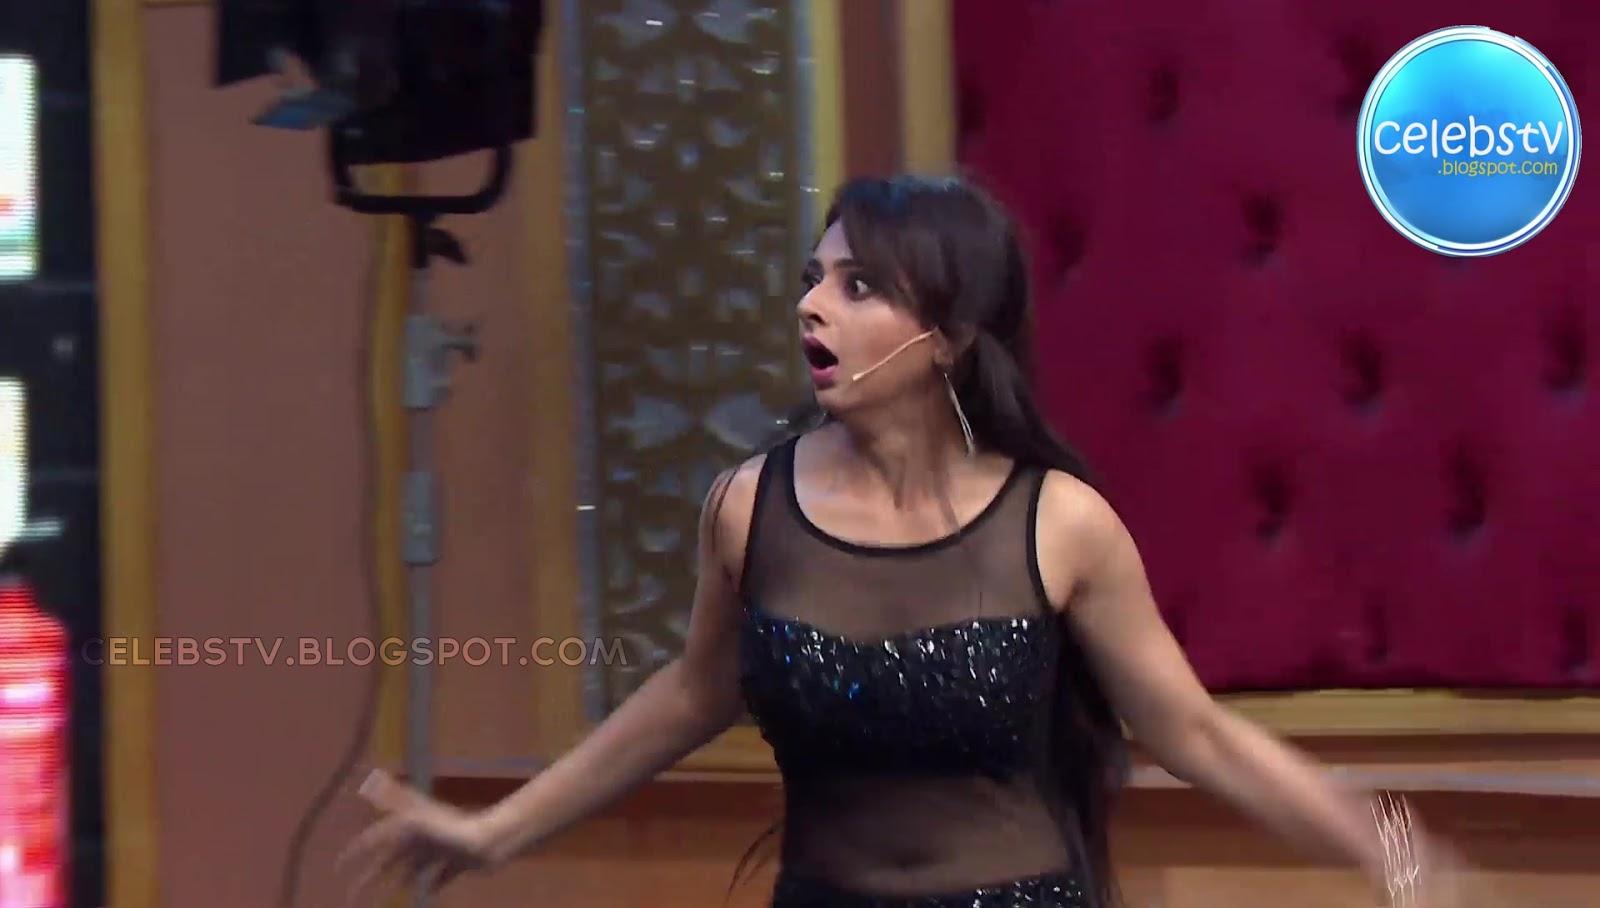 Sexy Tv Actress Monica Castelino Very Hot Navel Show In -6415